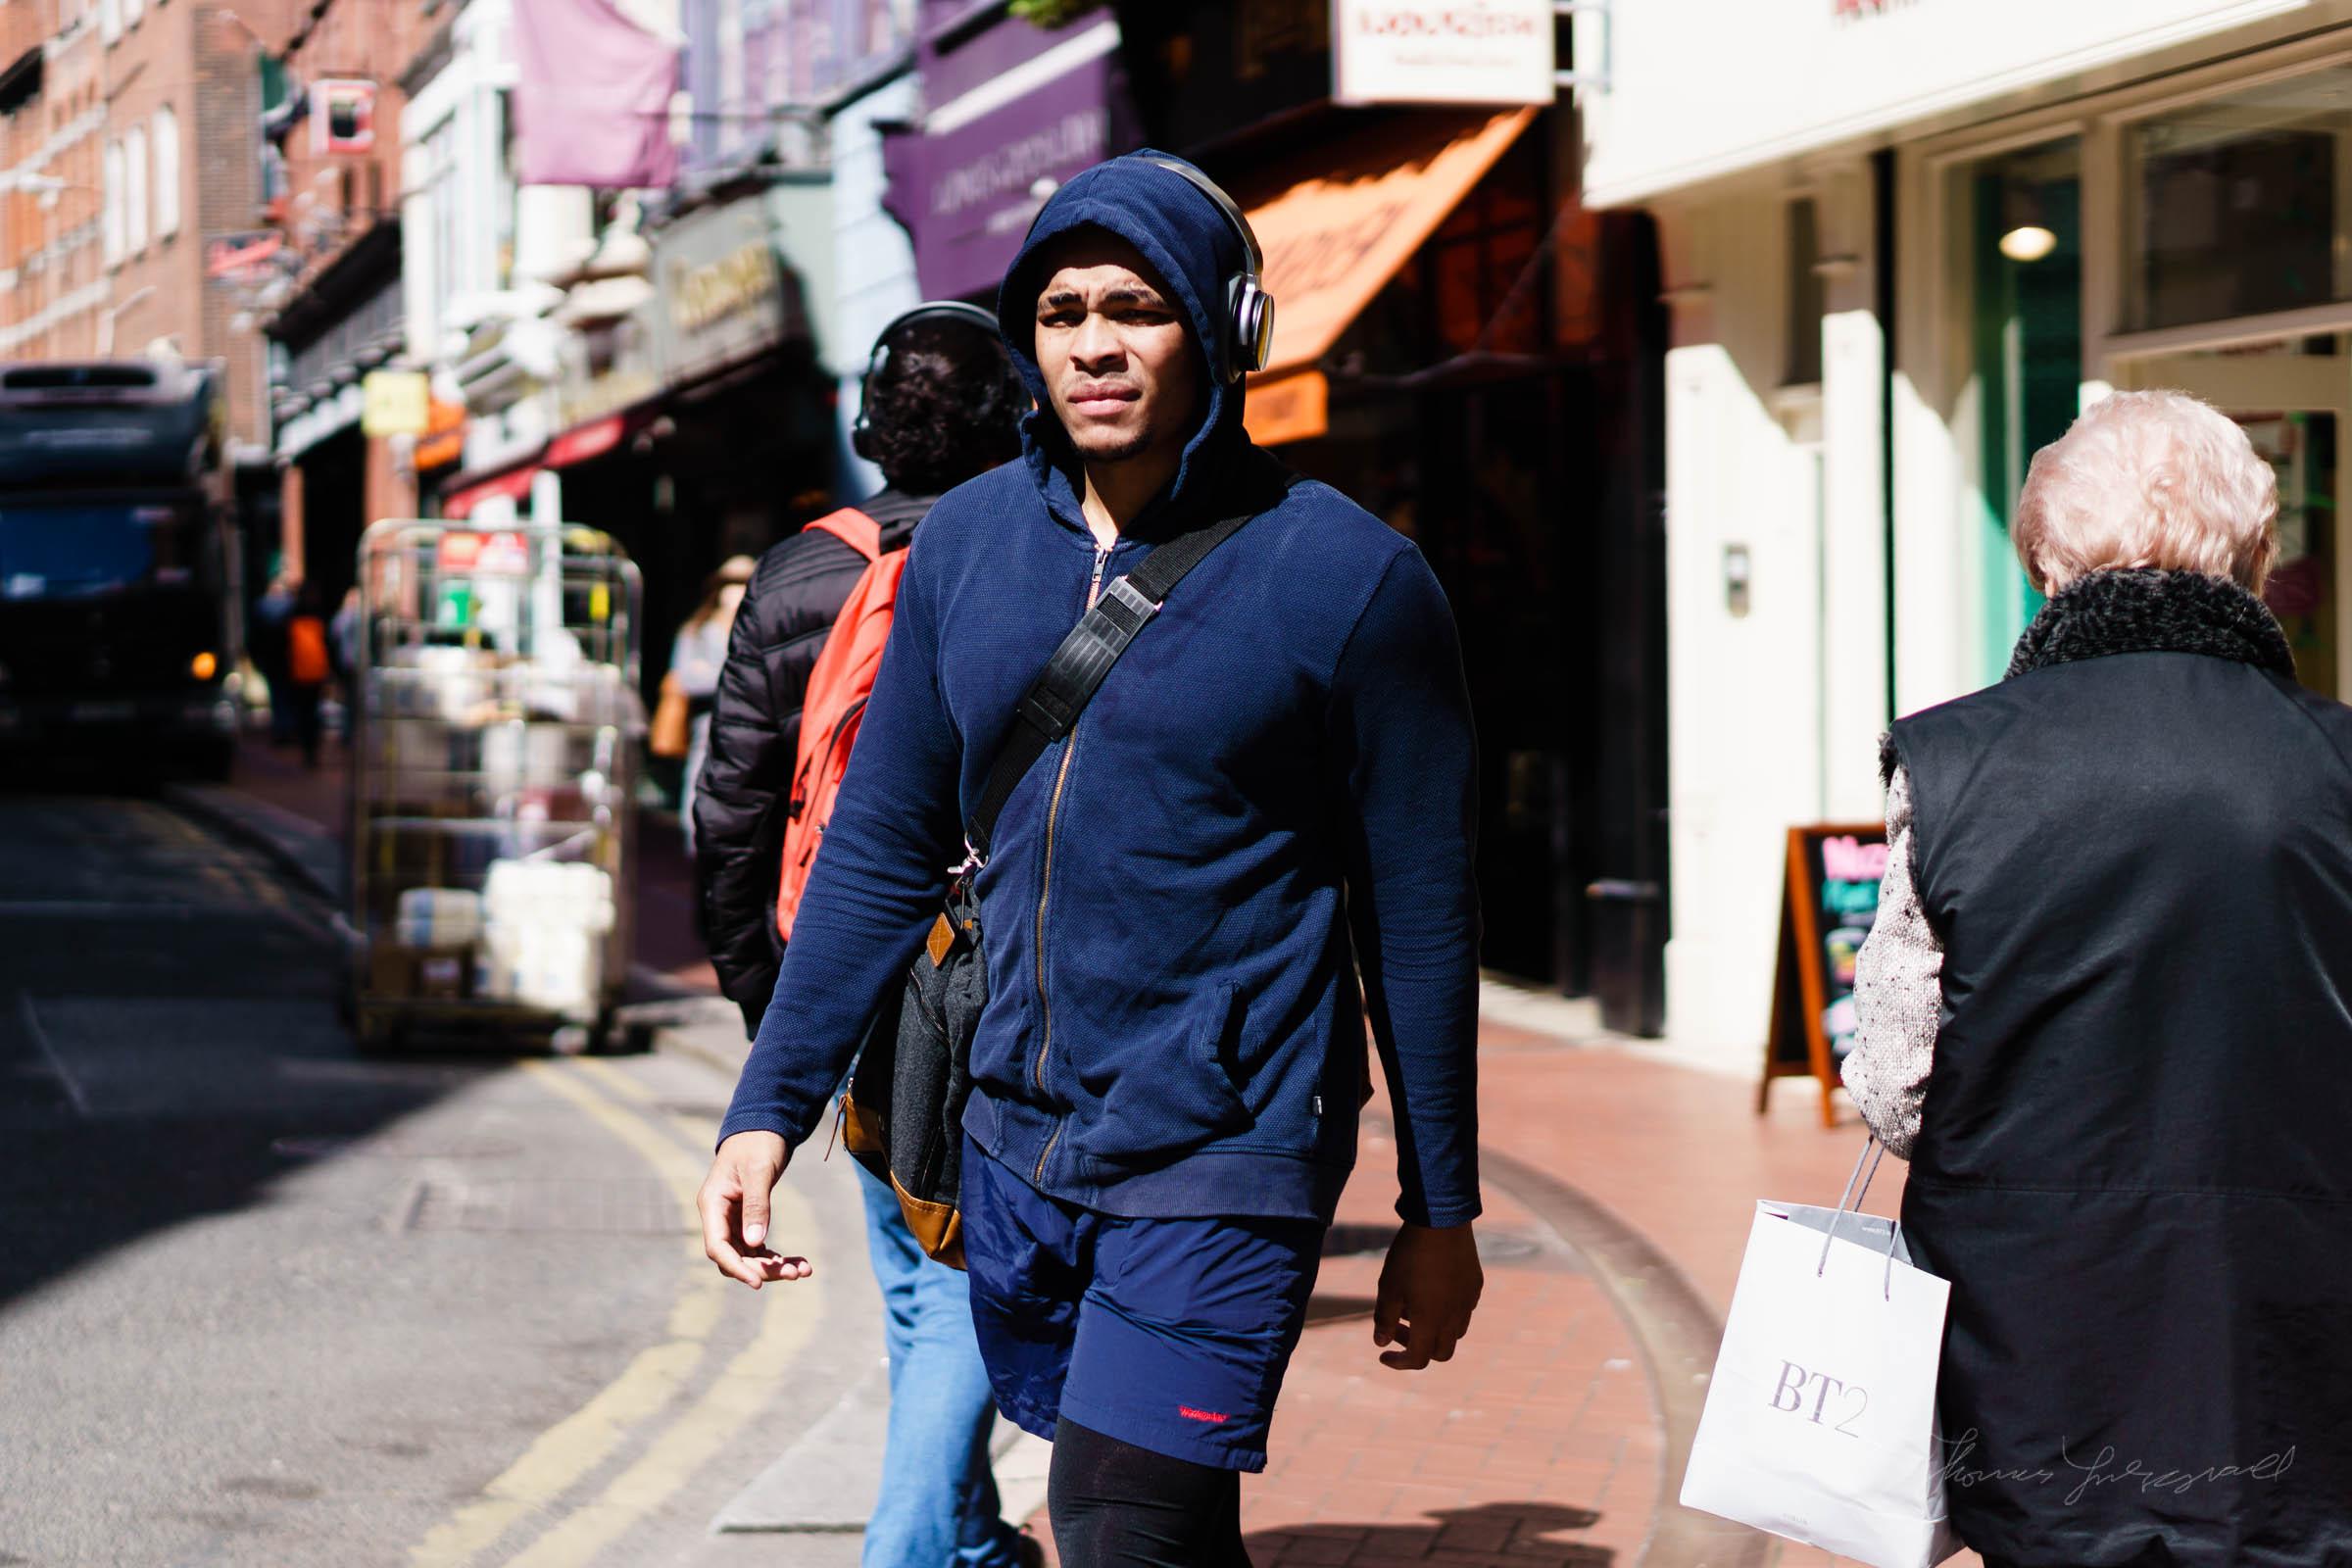 Man in a hoodie wearing headphones - Street Photography in Dubli